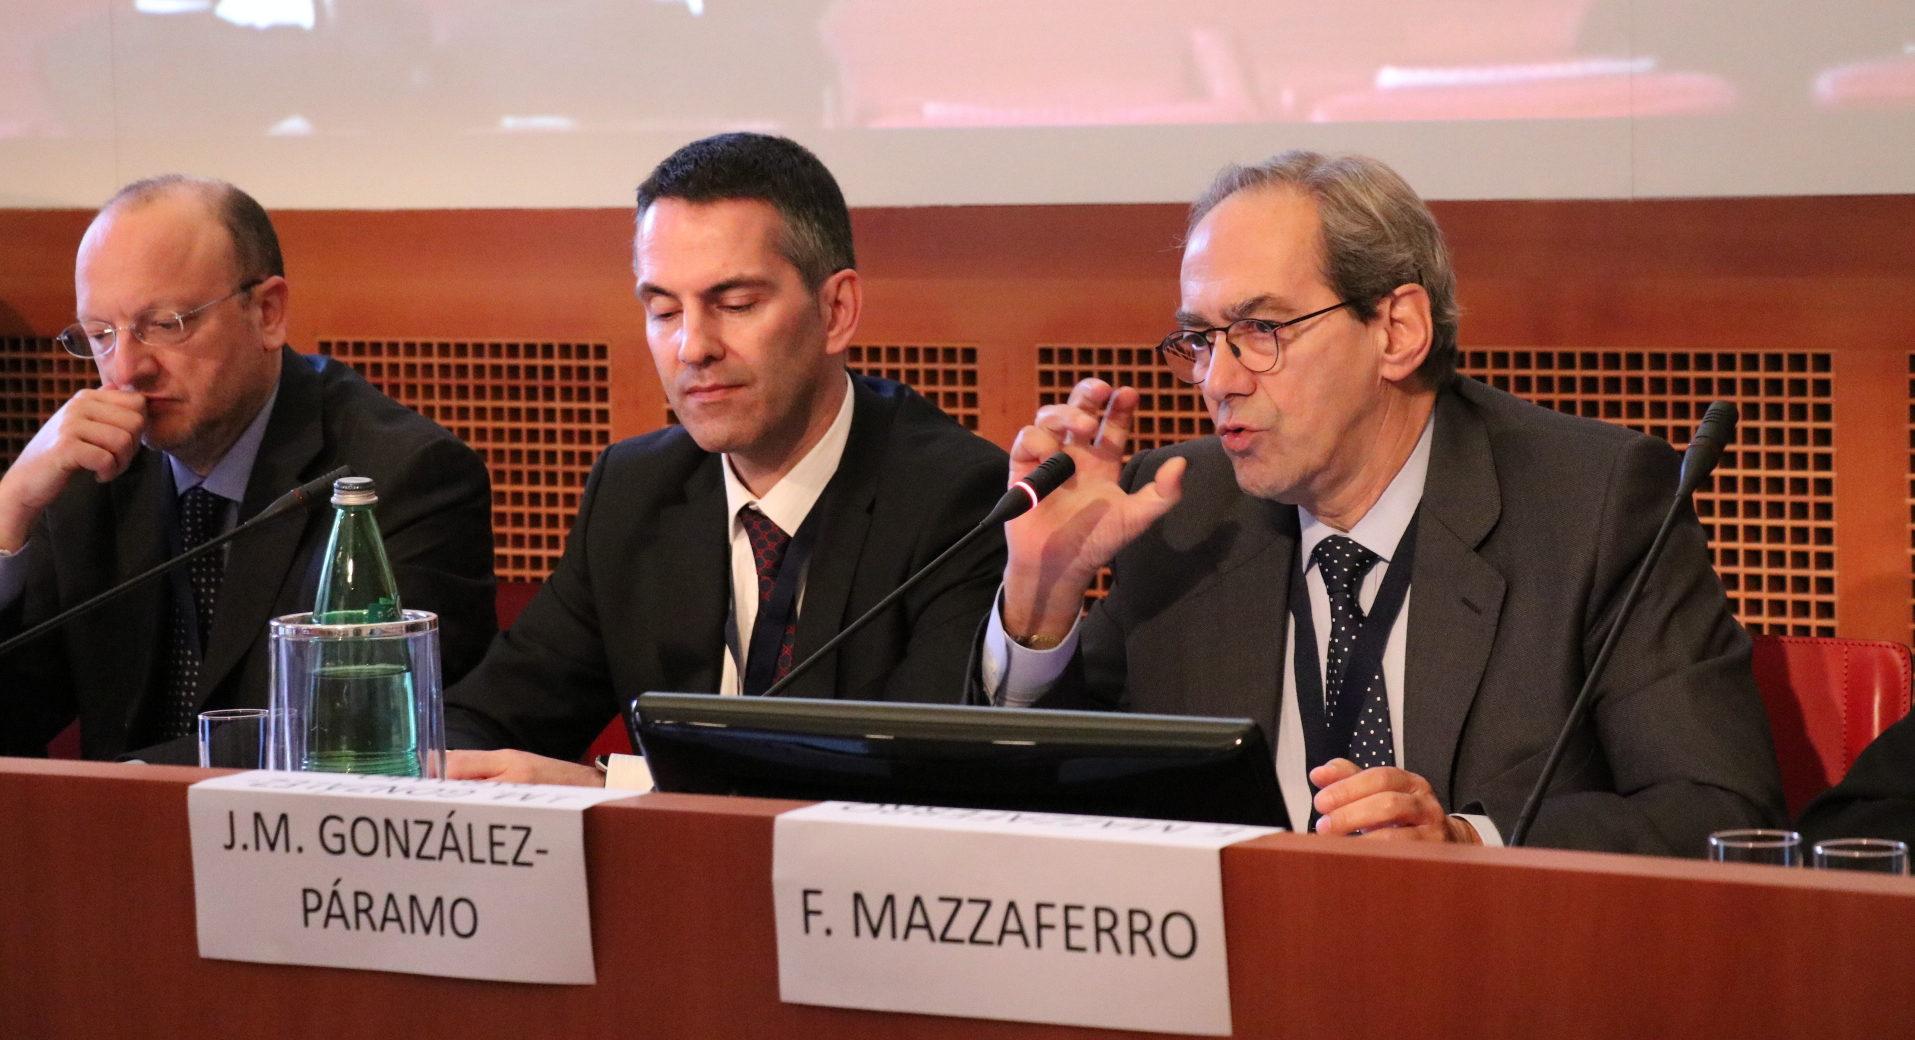 José Manuel González-Páramo, consejero ejecutivo de BBVA, en Rome Investment Forum